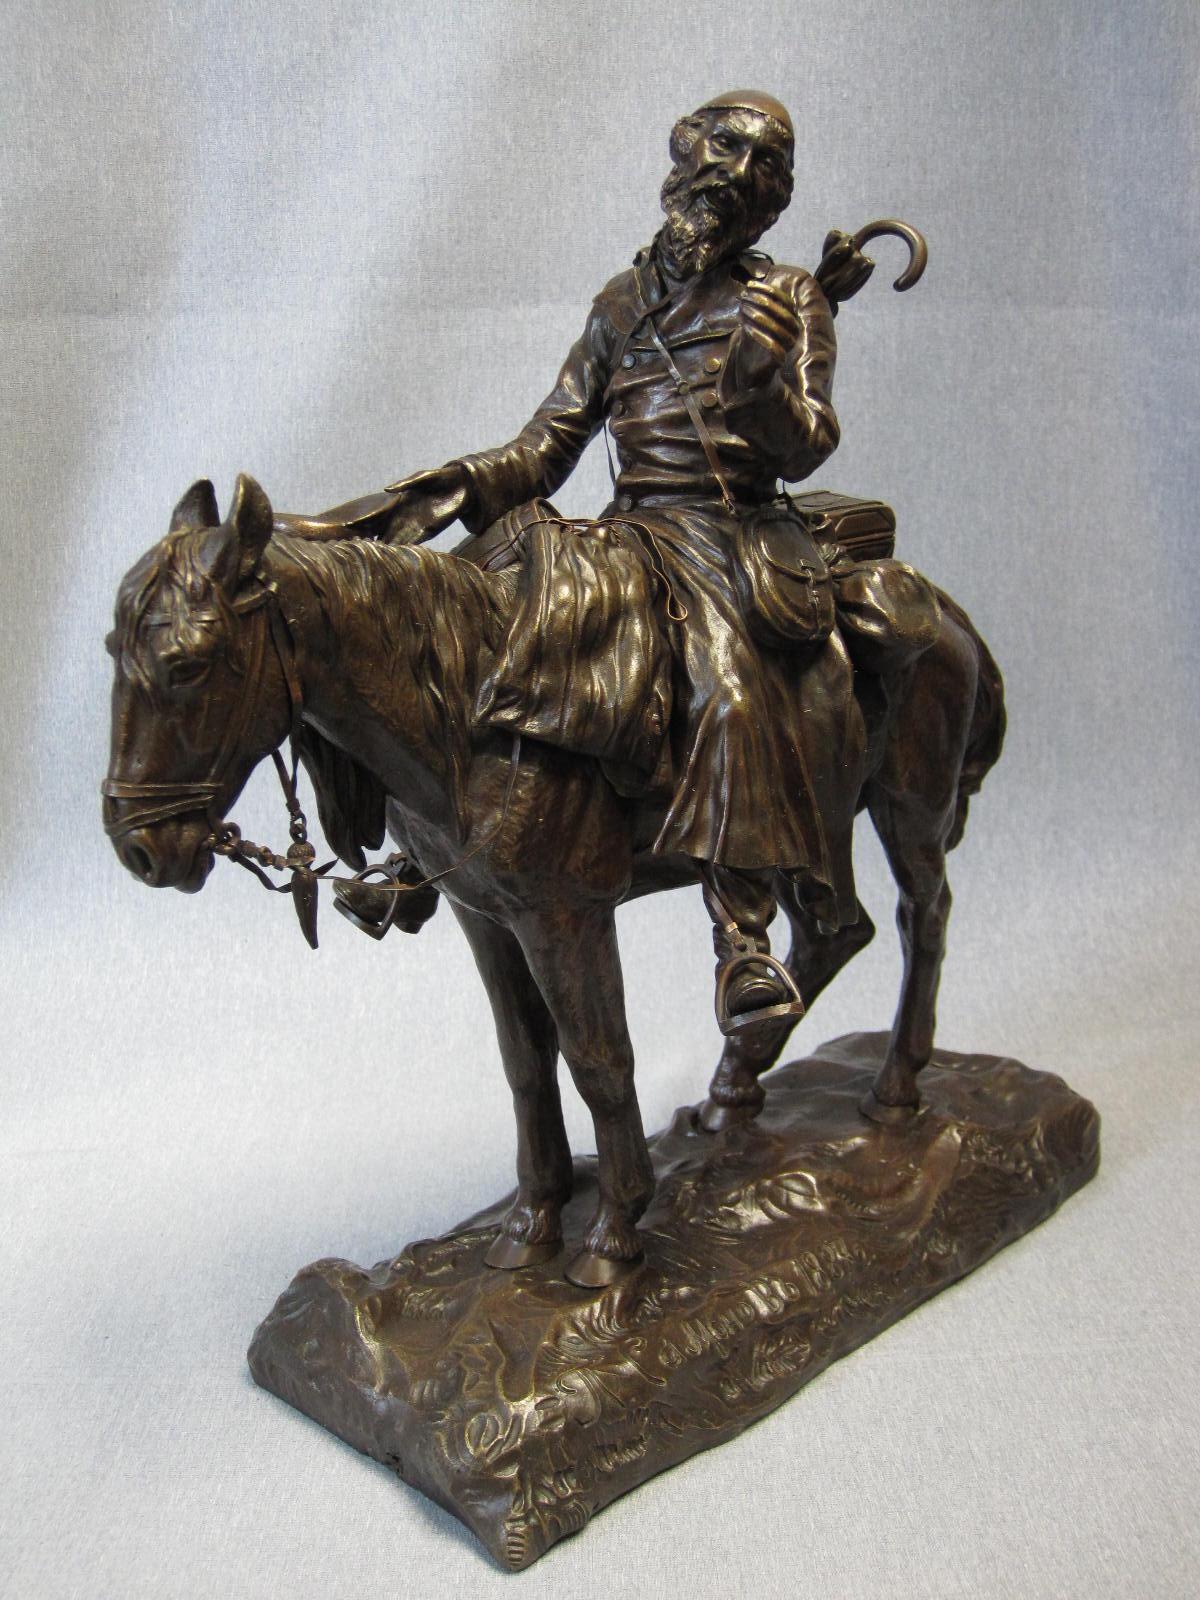 samonov-samonoff - jew-horseback-bronze_samonoff